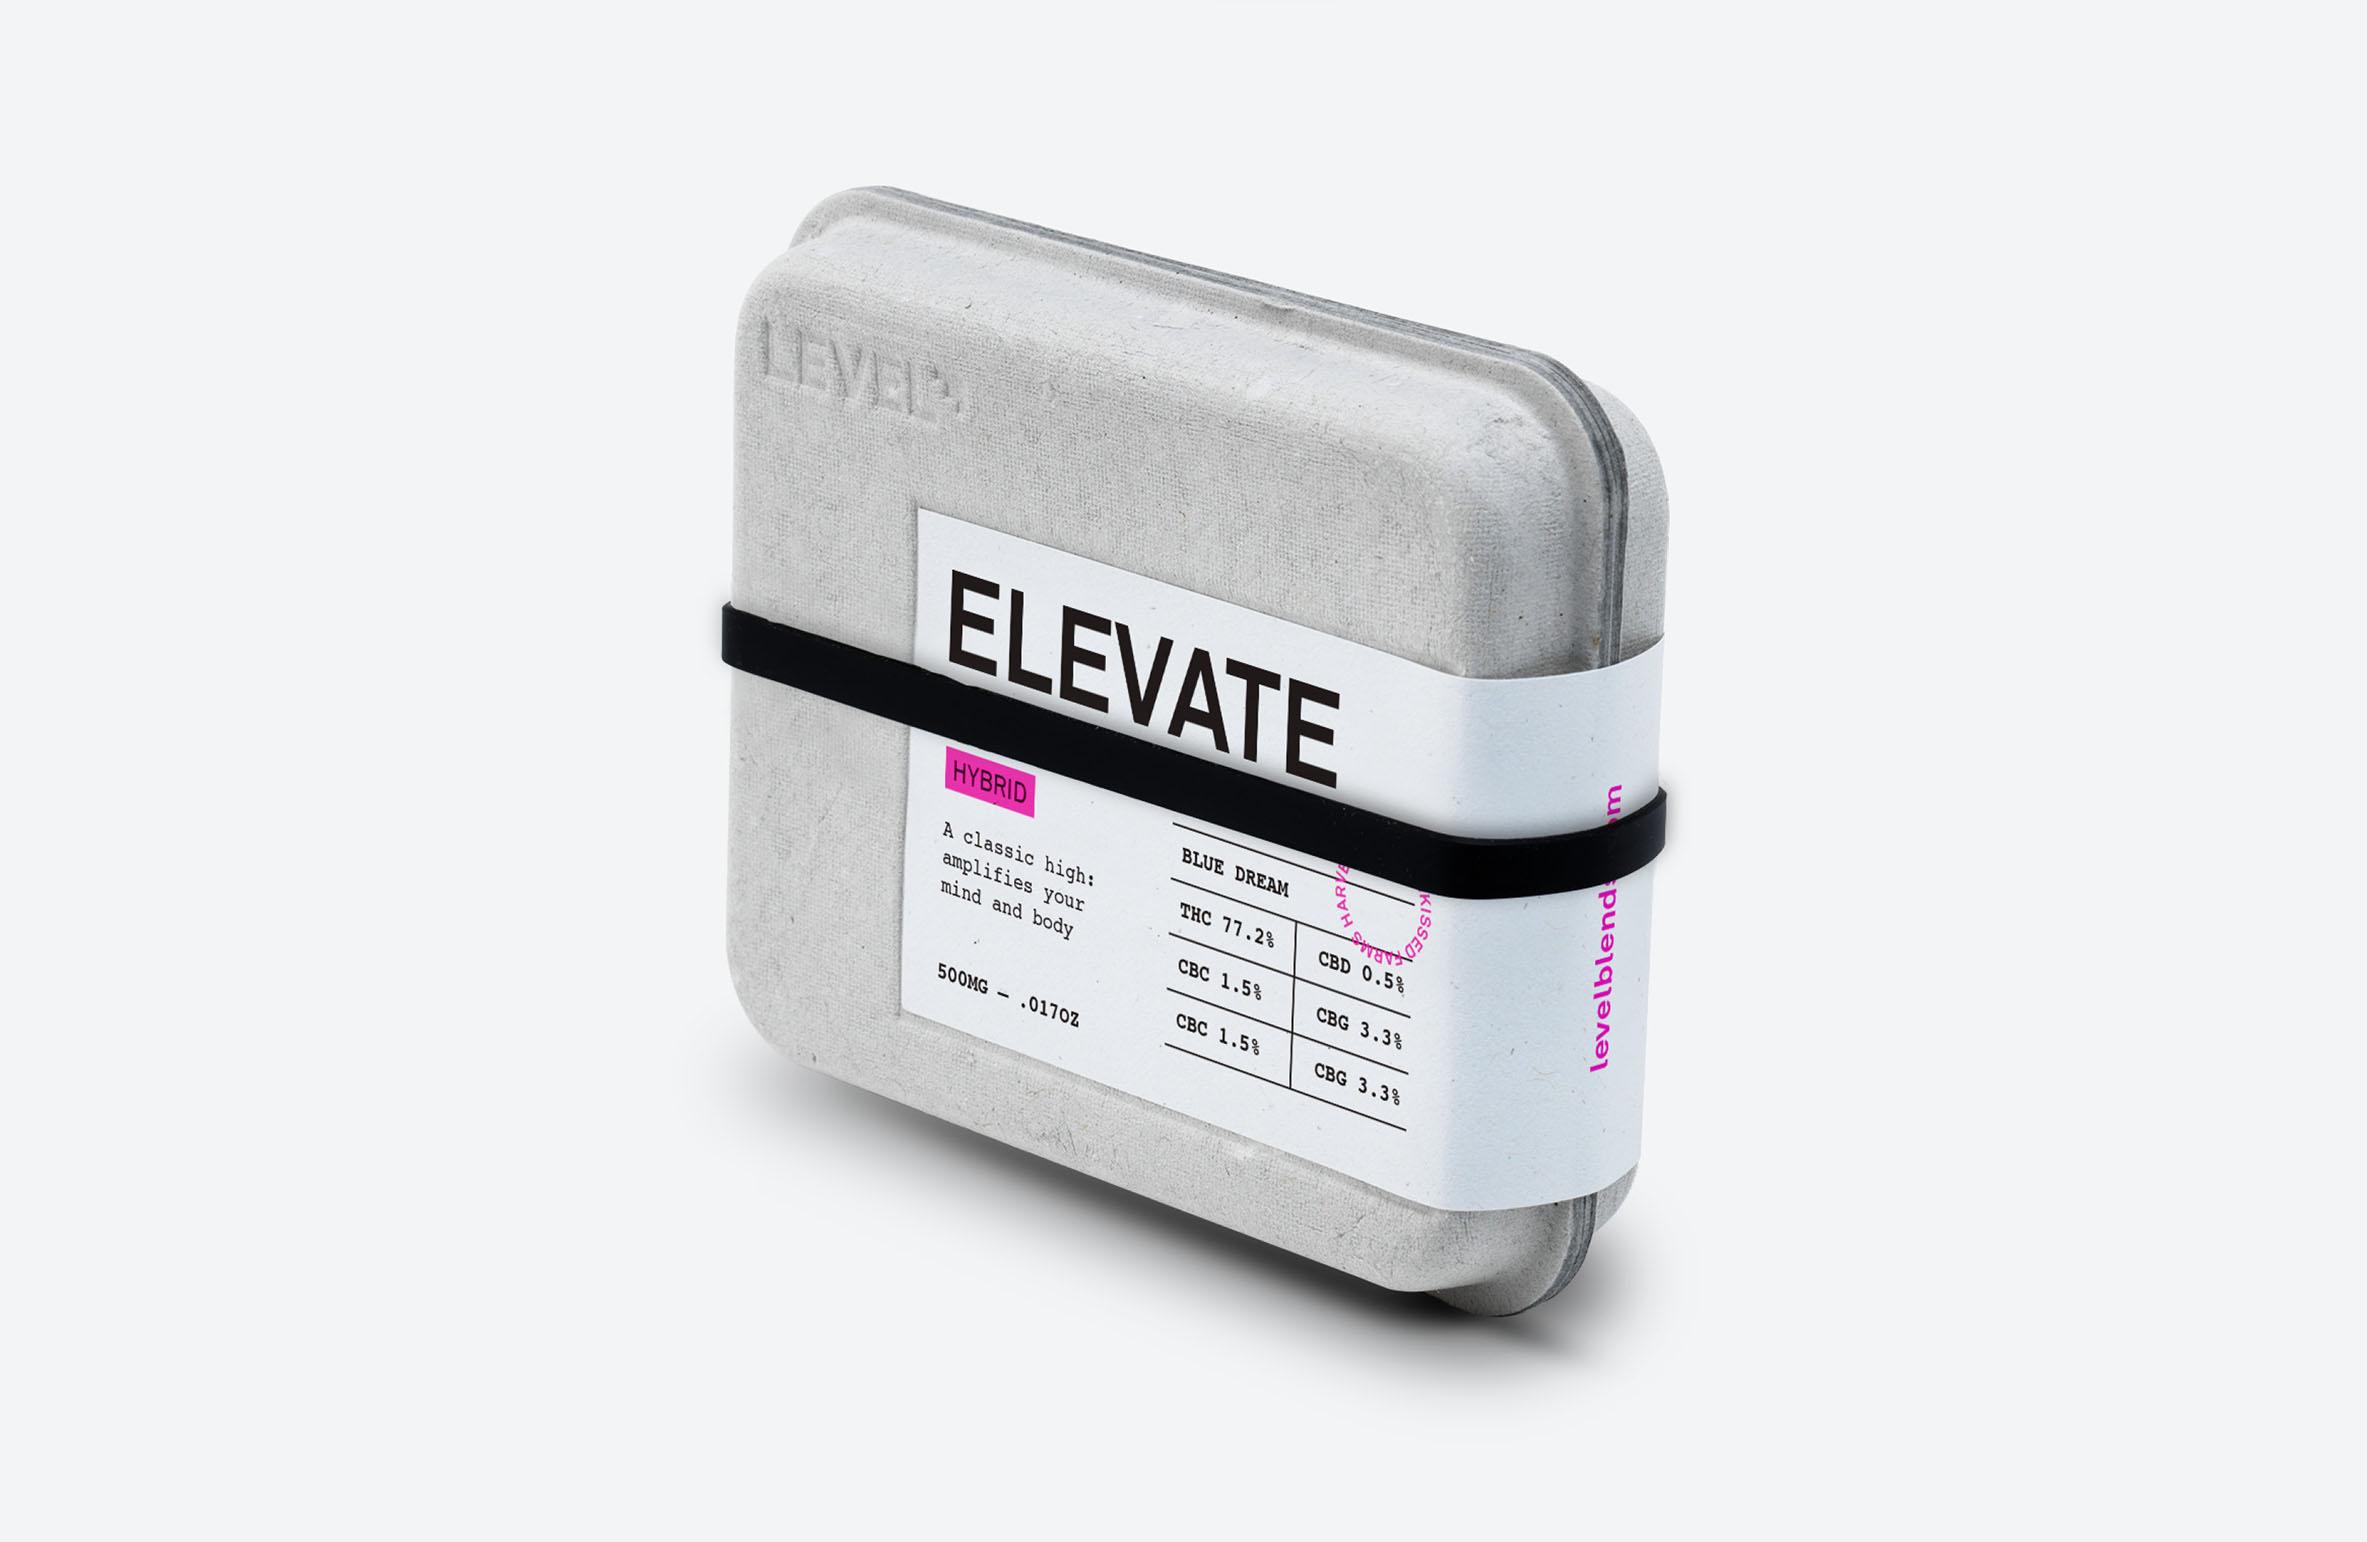 LEVEL_510_Elevate3-2.jpg